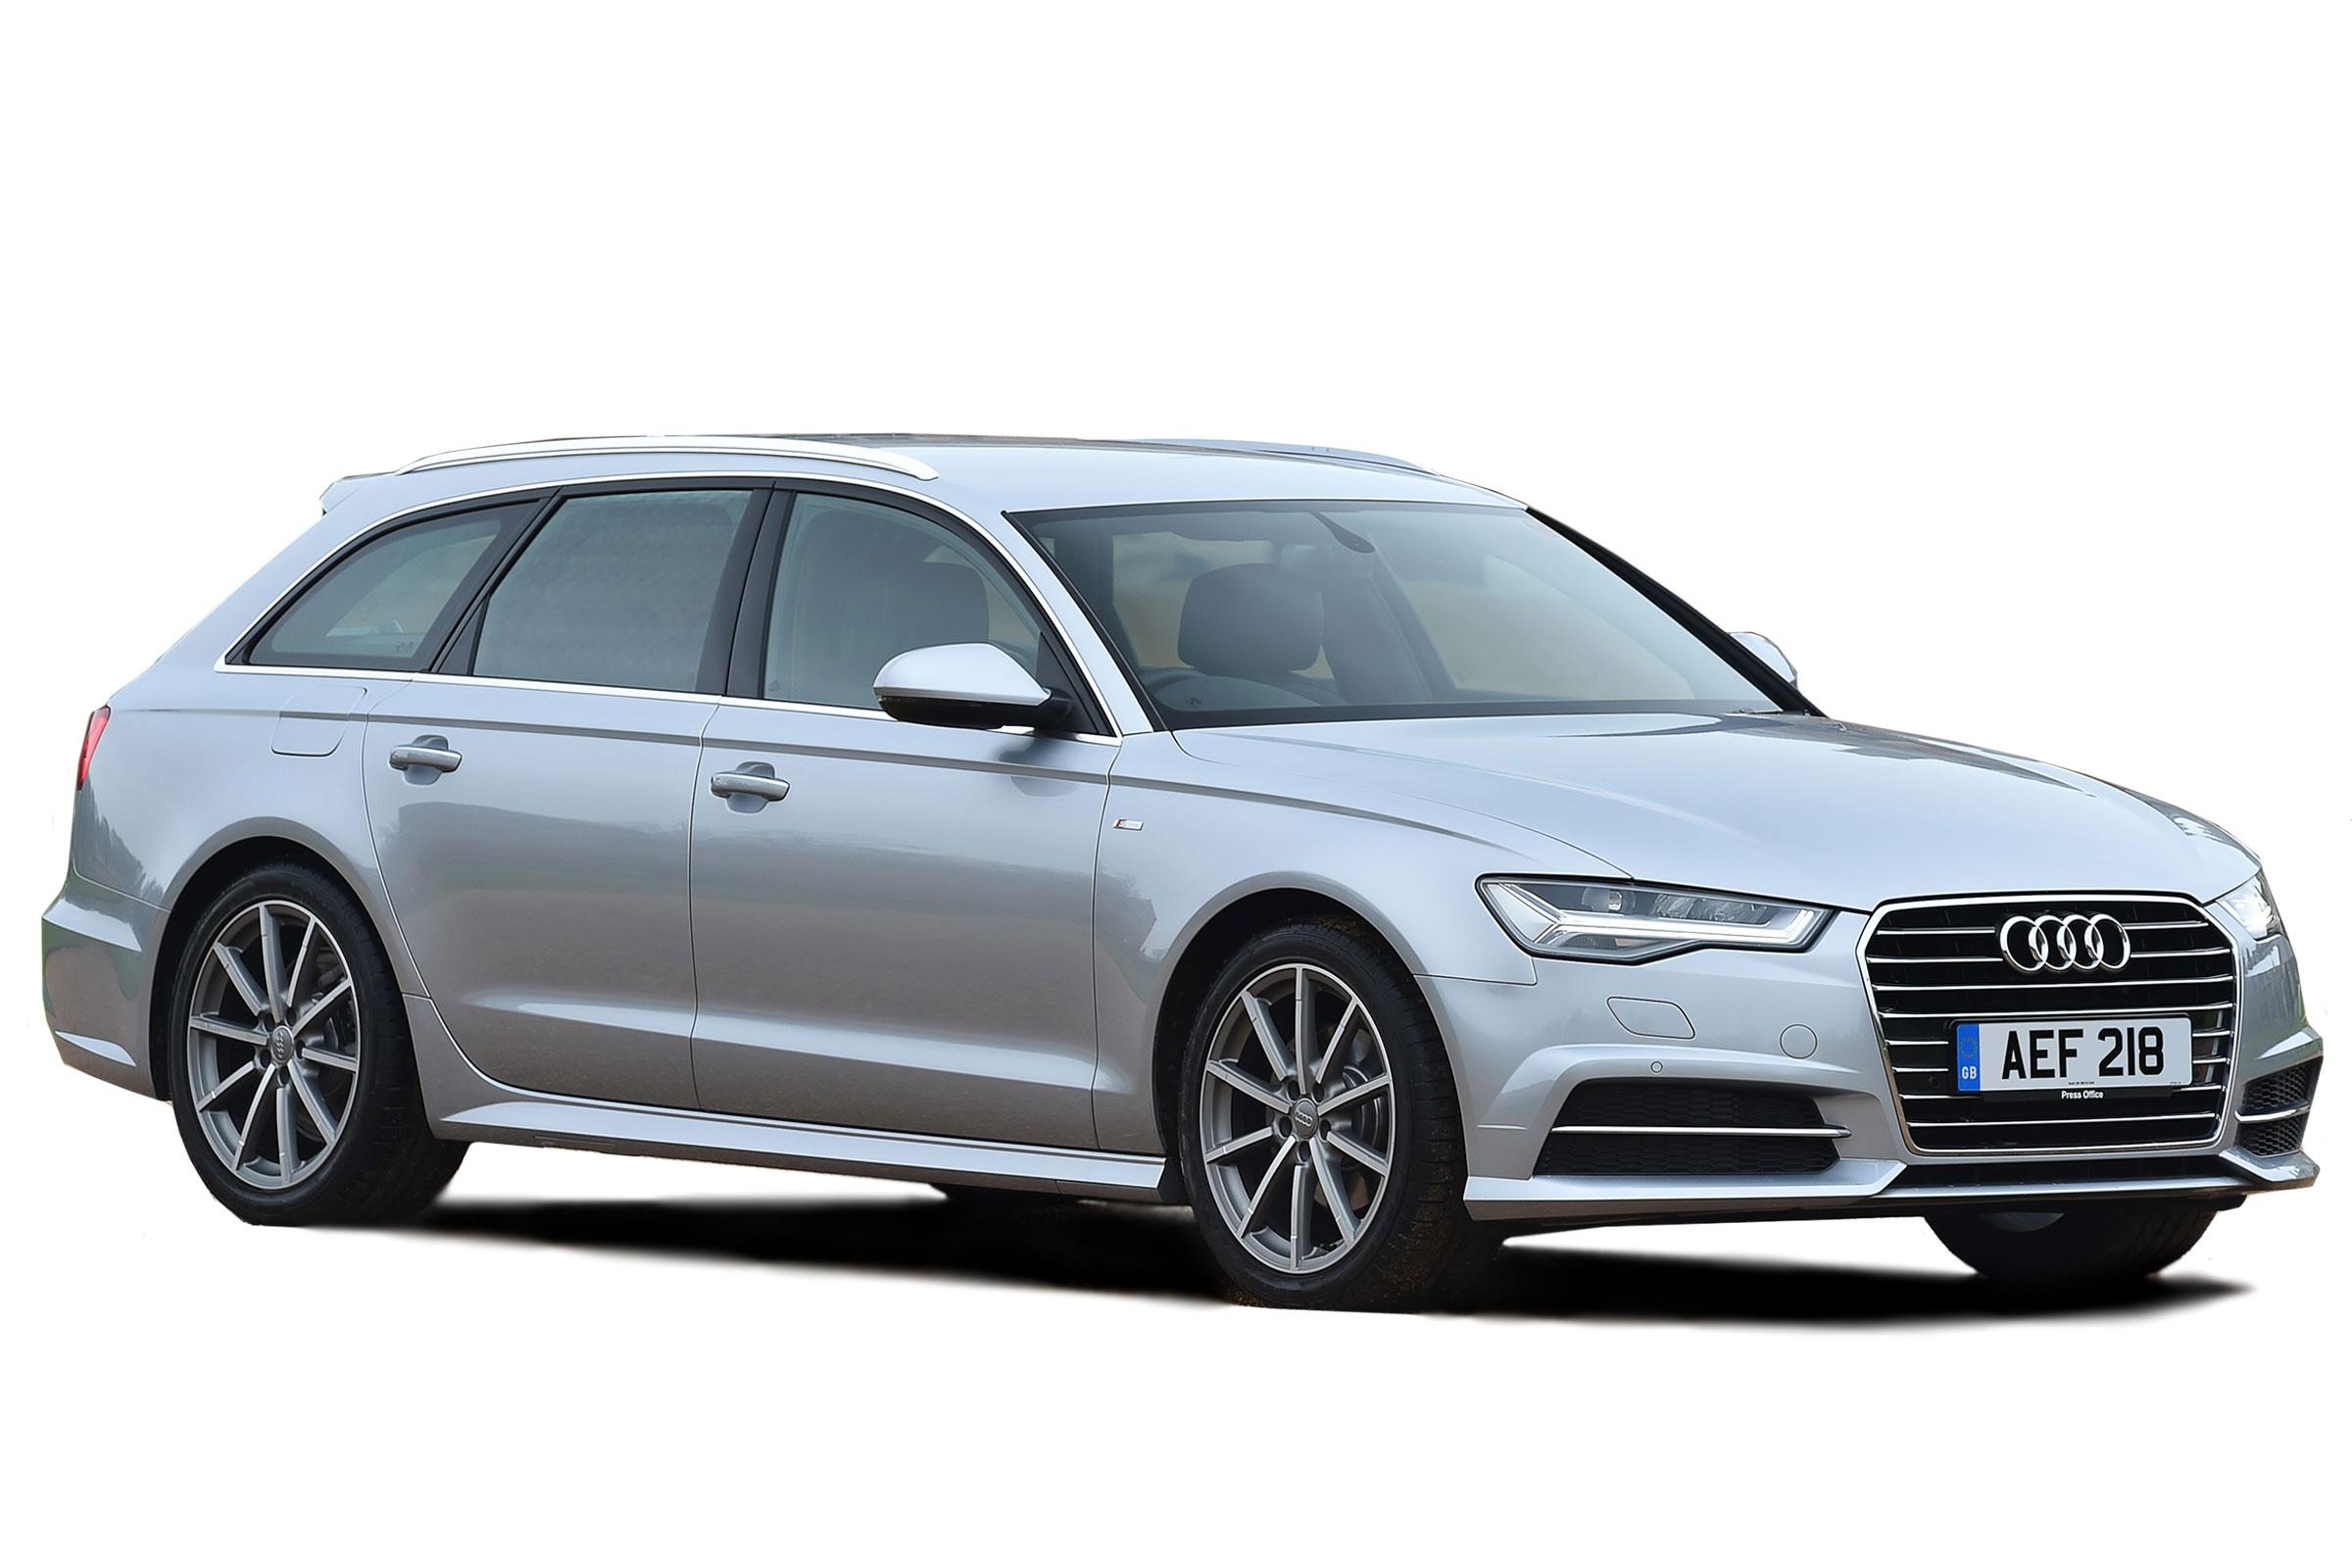 Audi A6 Avant Estate 2011 2018 Engines Drive Performance Carbuyer